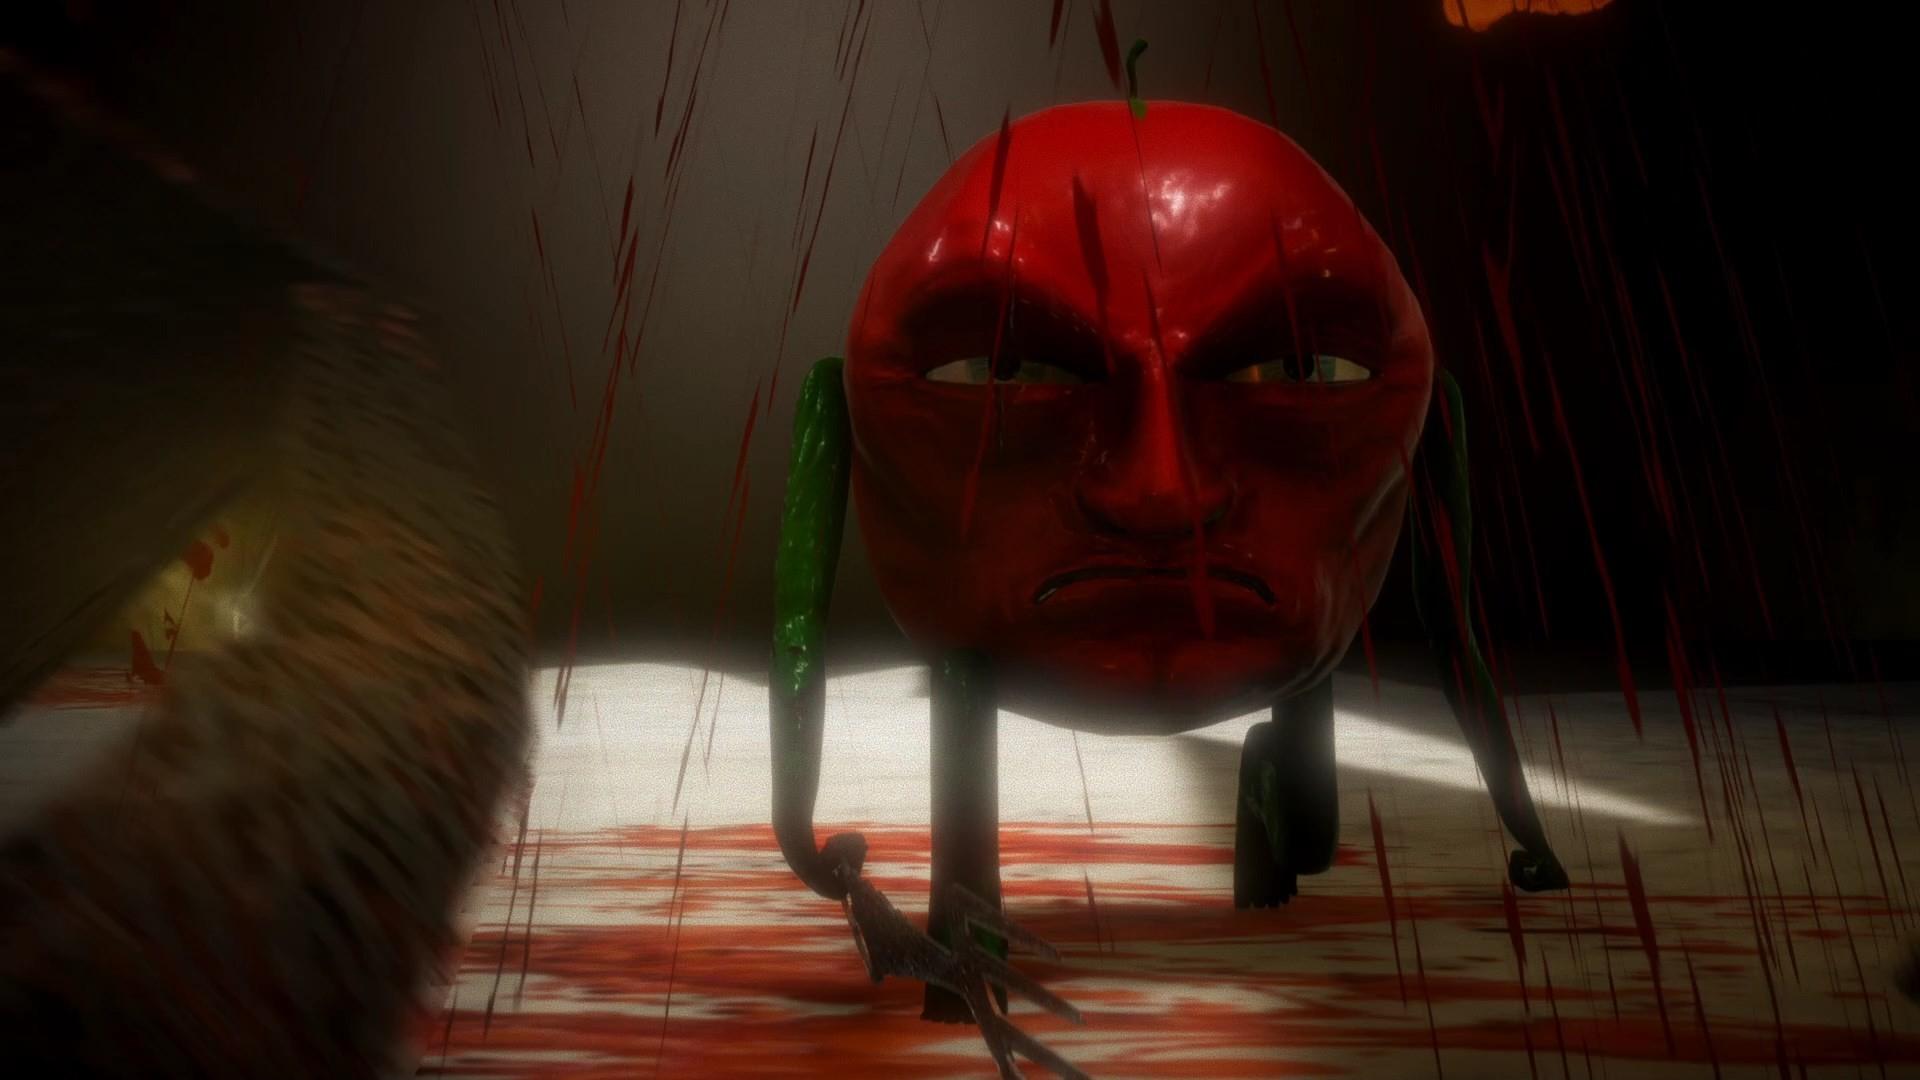 Tomato Way 3 Free Download